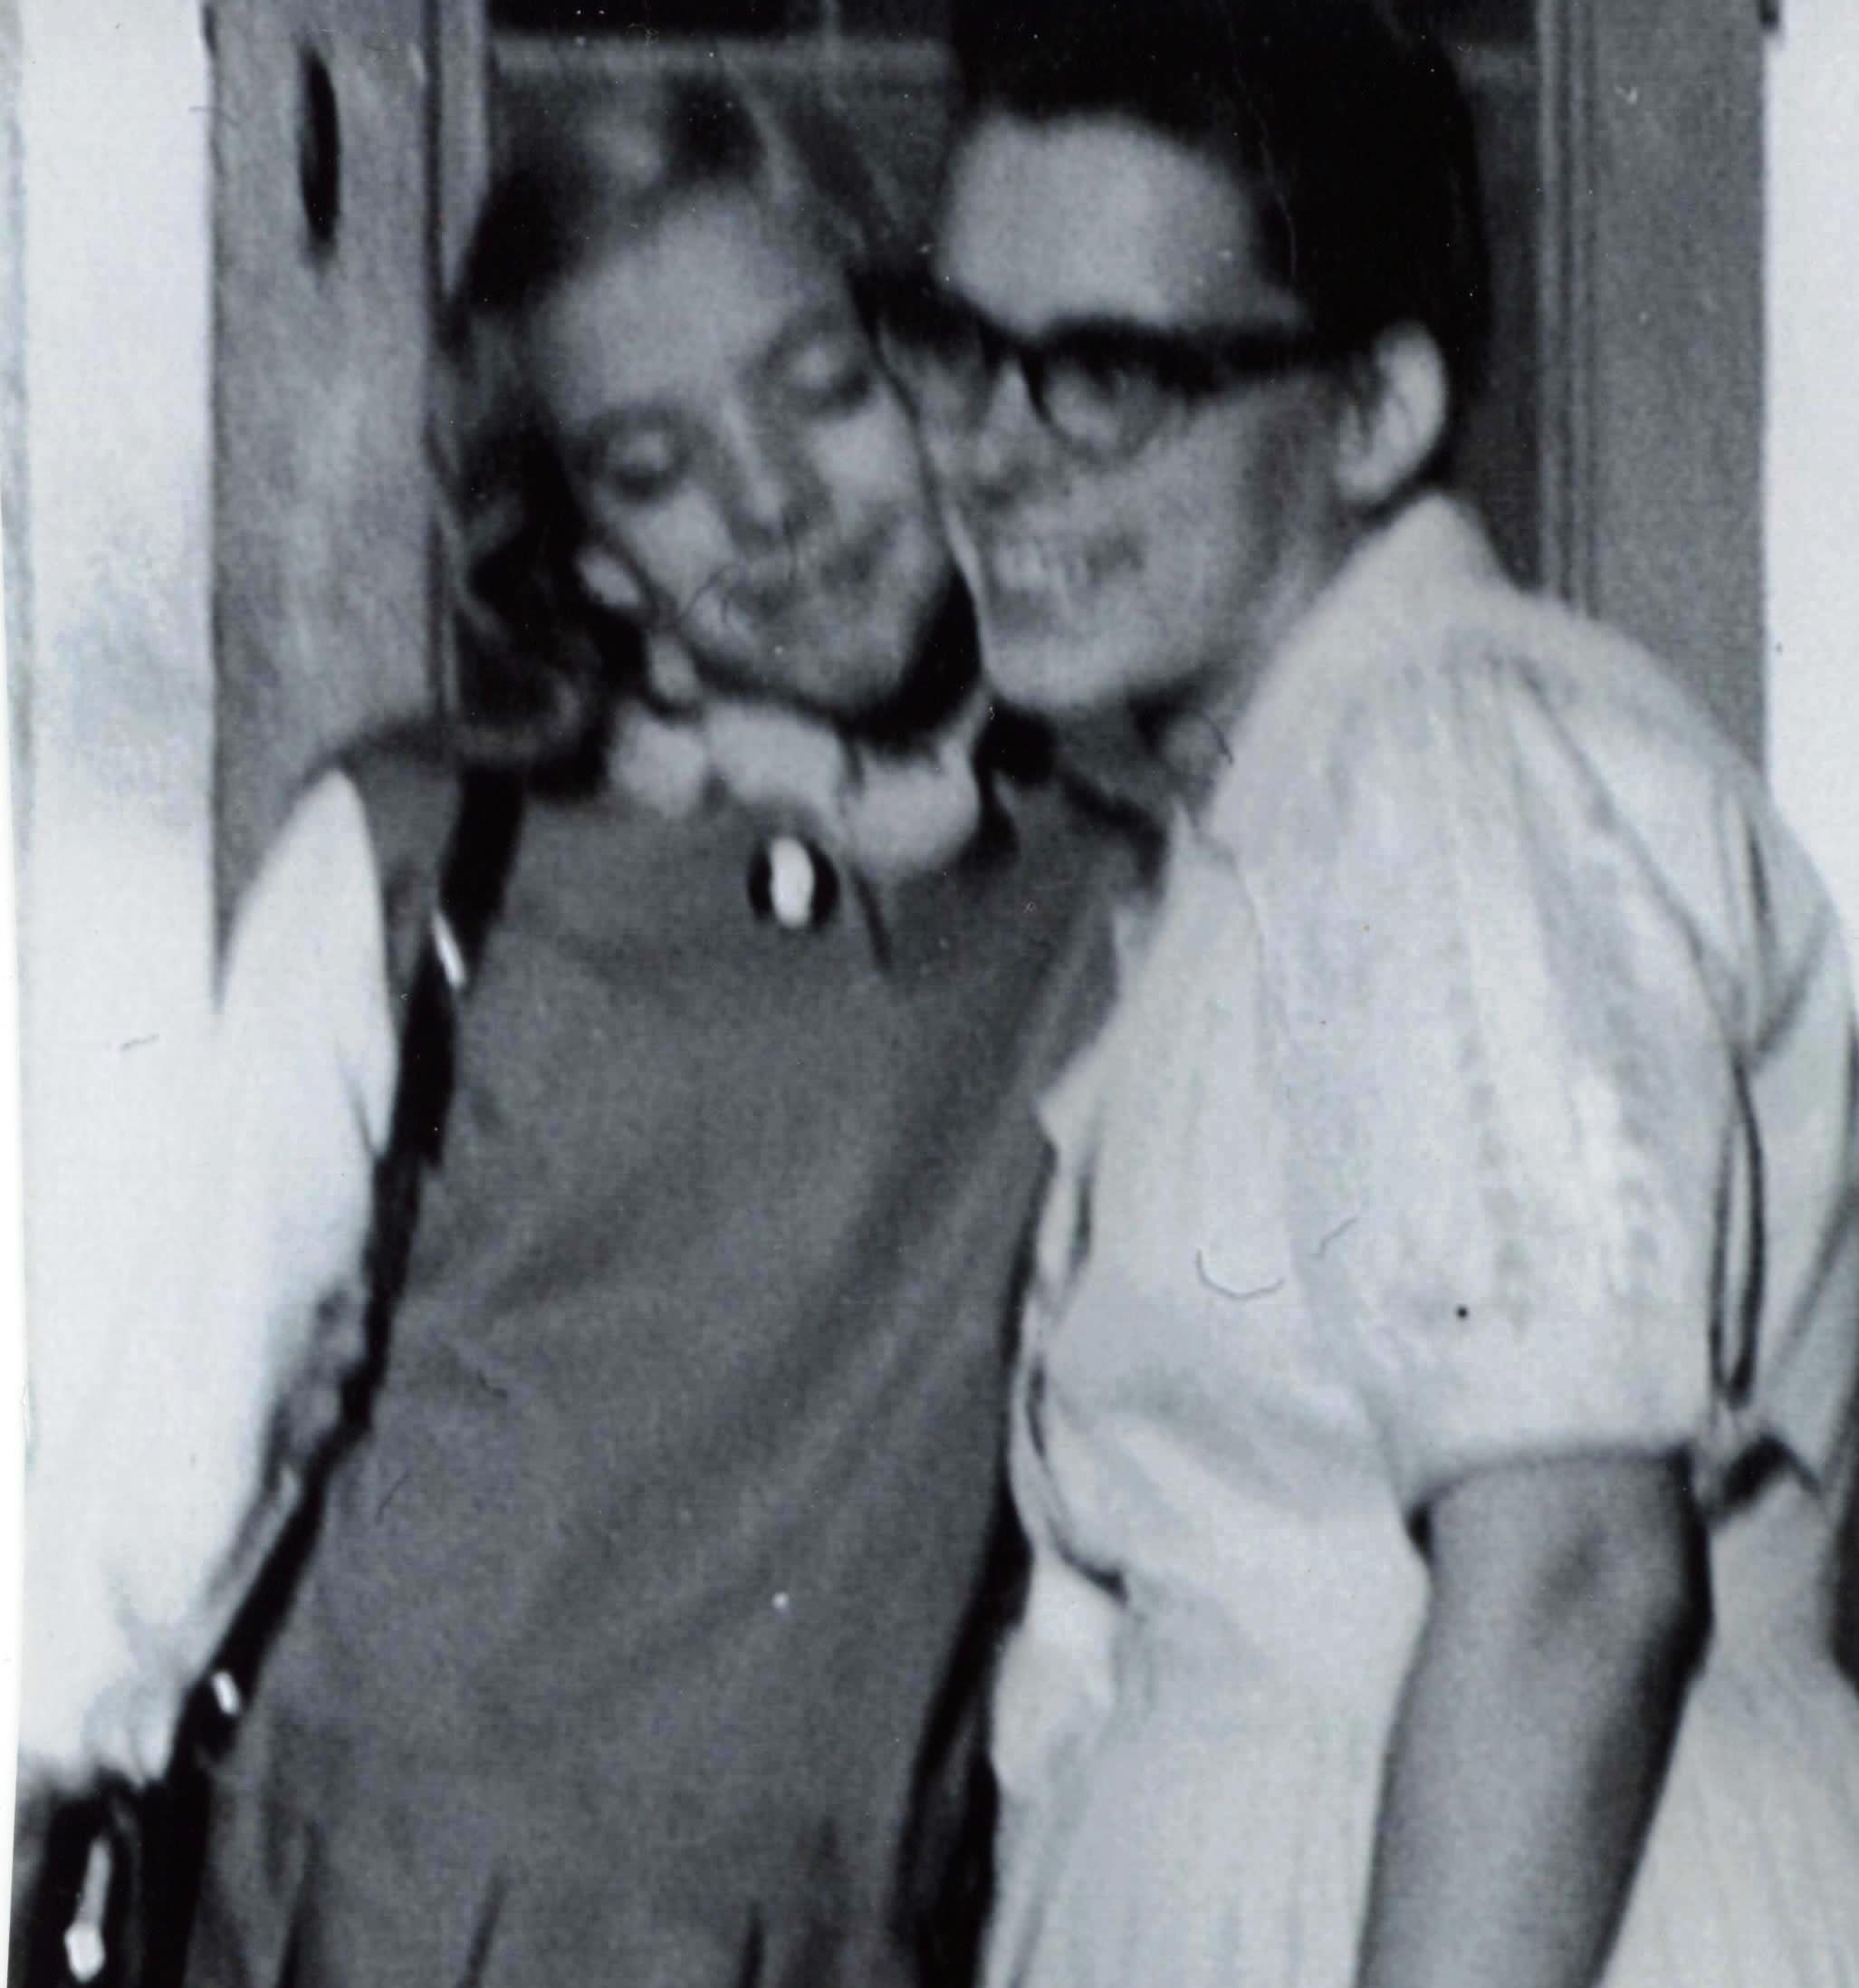 mom-and-me-1960s.JPG